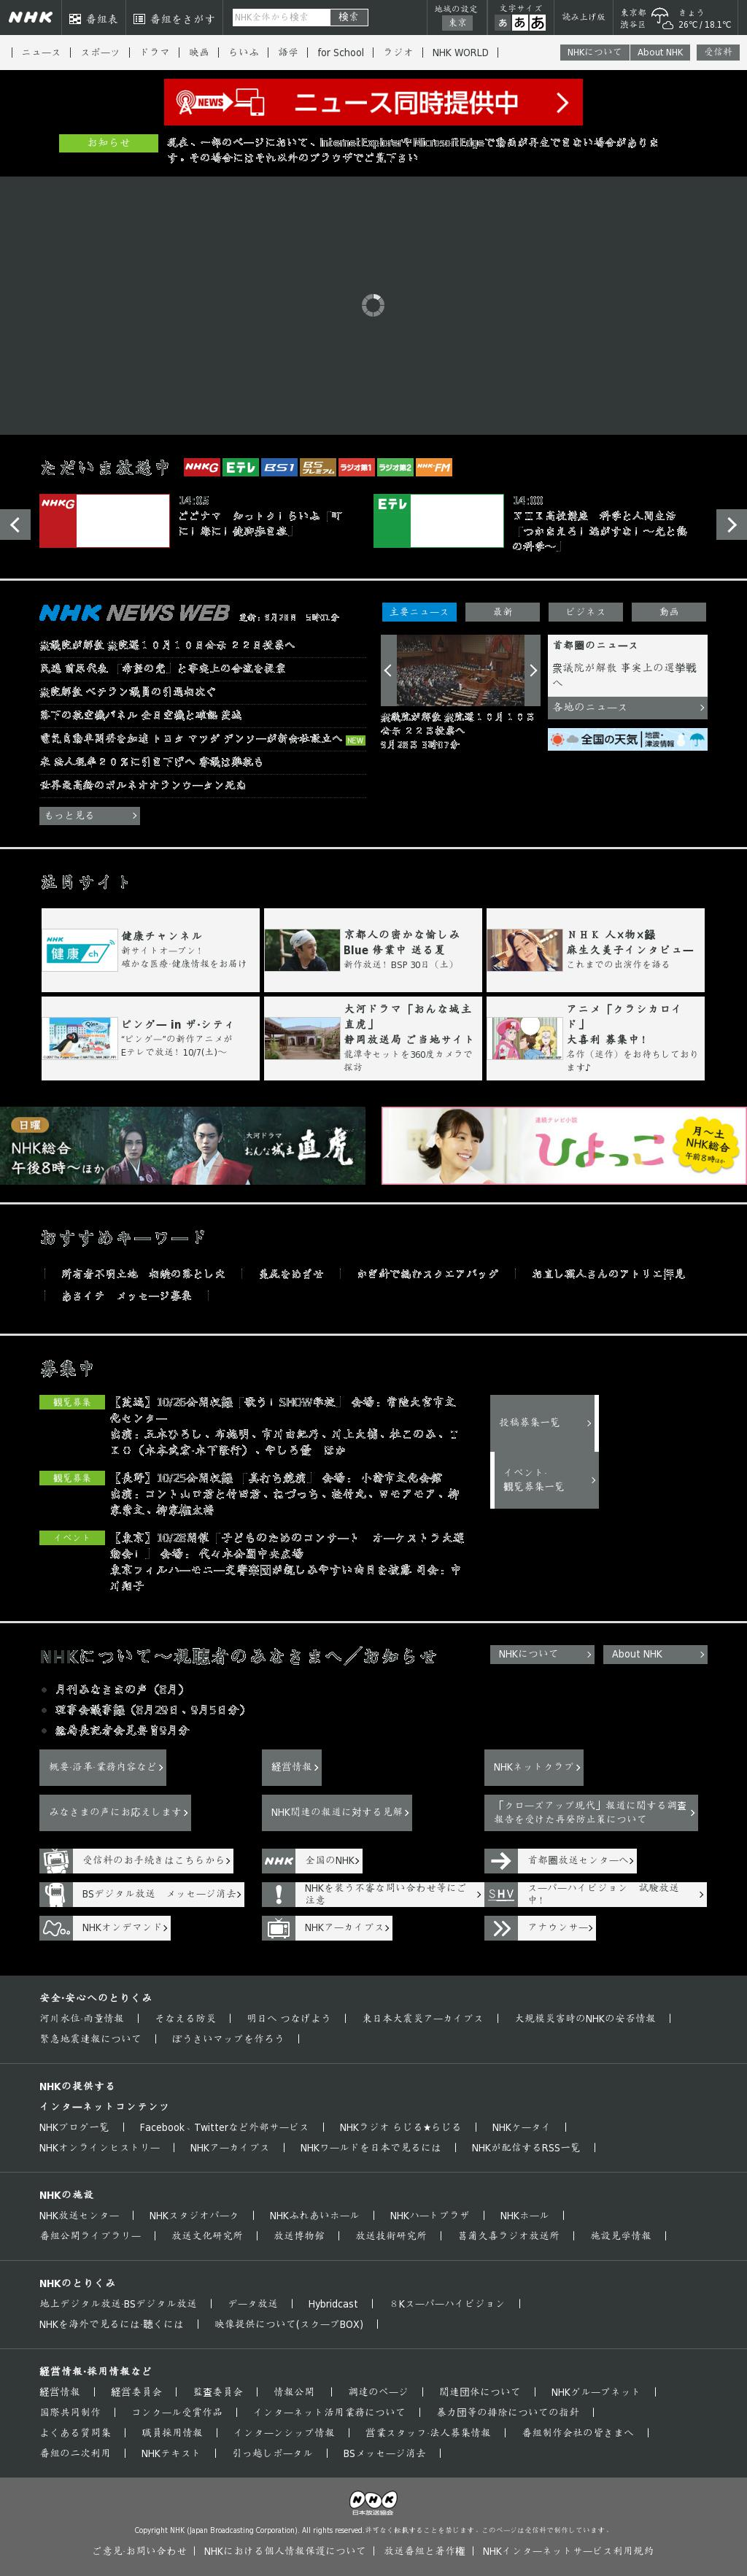 NHK Online at Thursday Sept. 28, 2017, 5:09 a.m. UTC